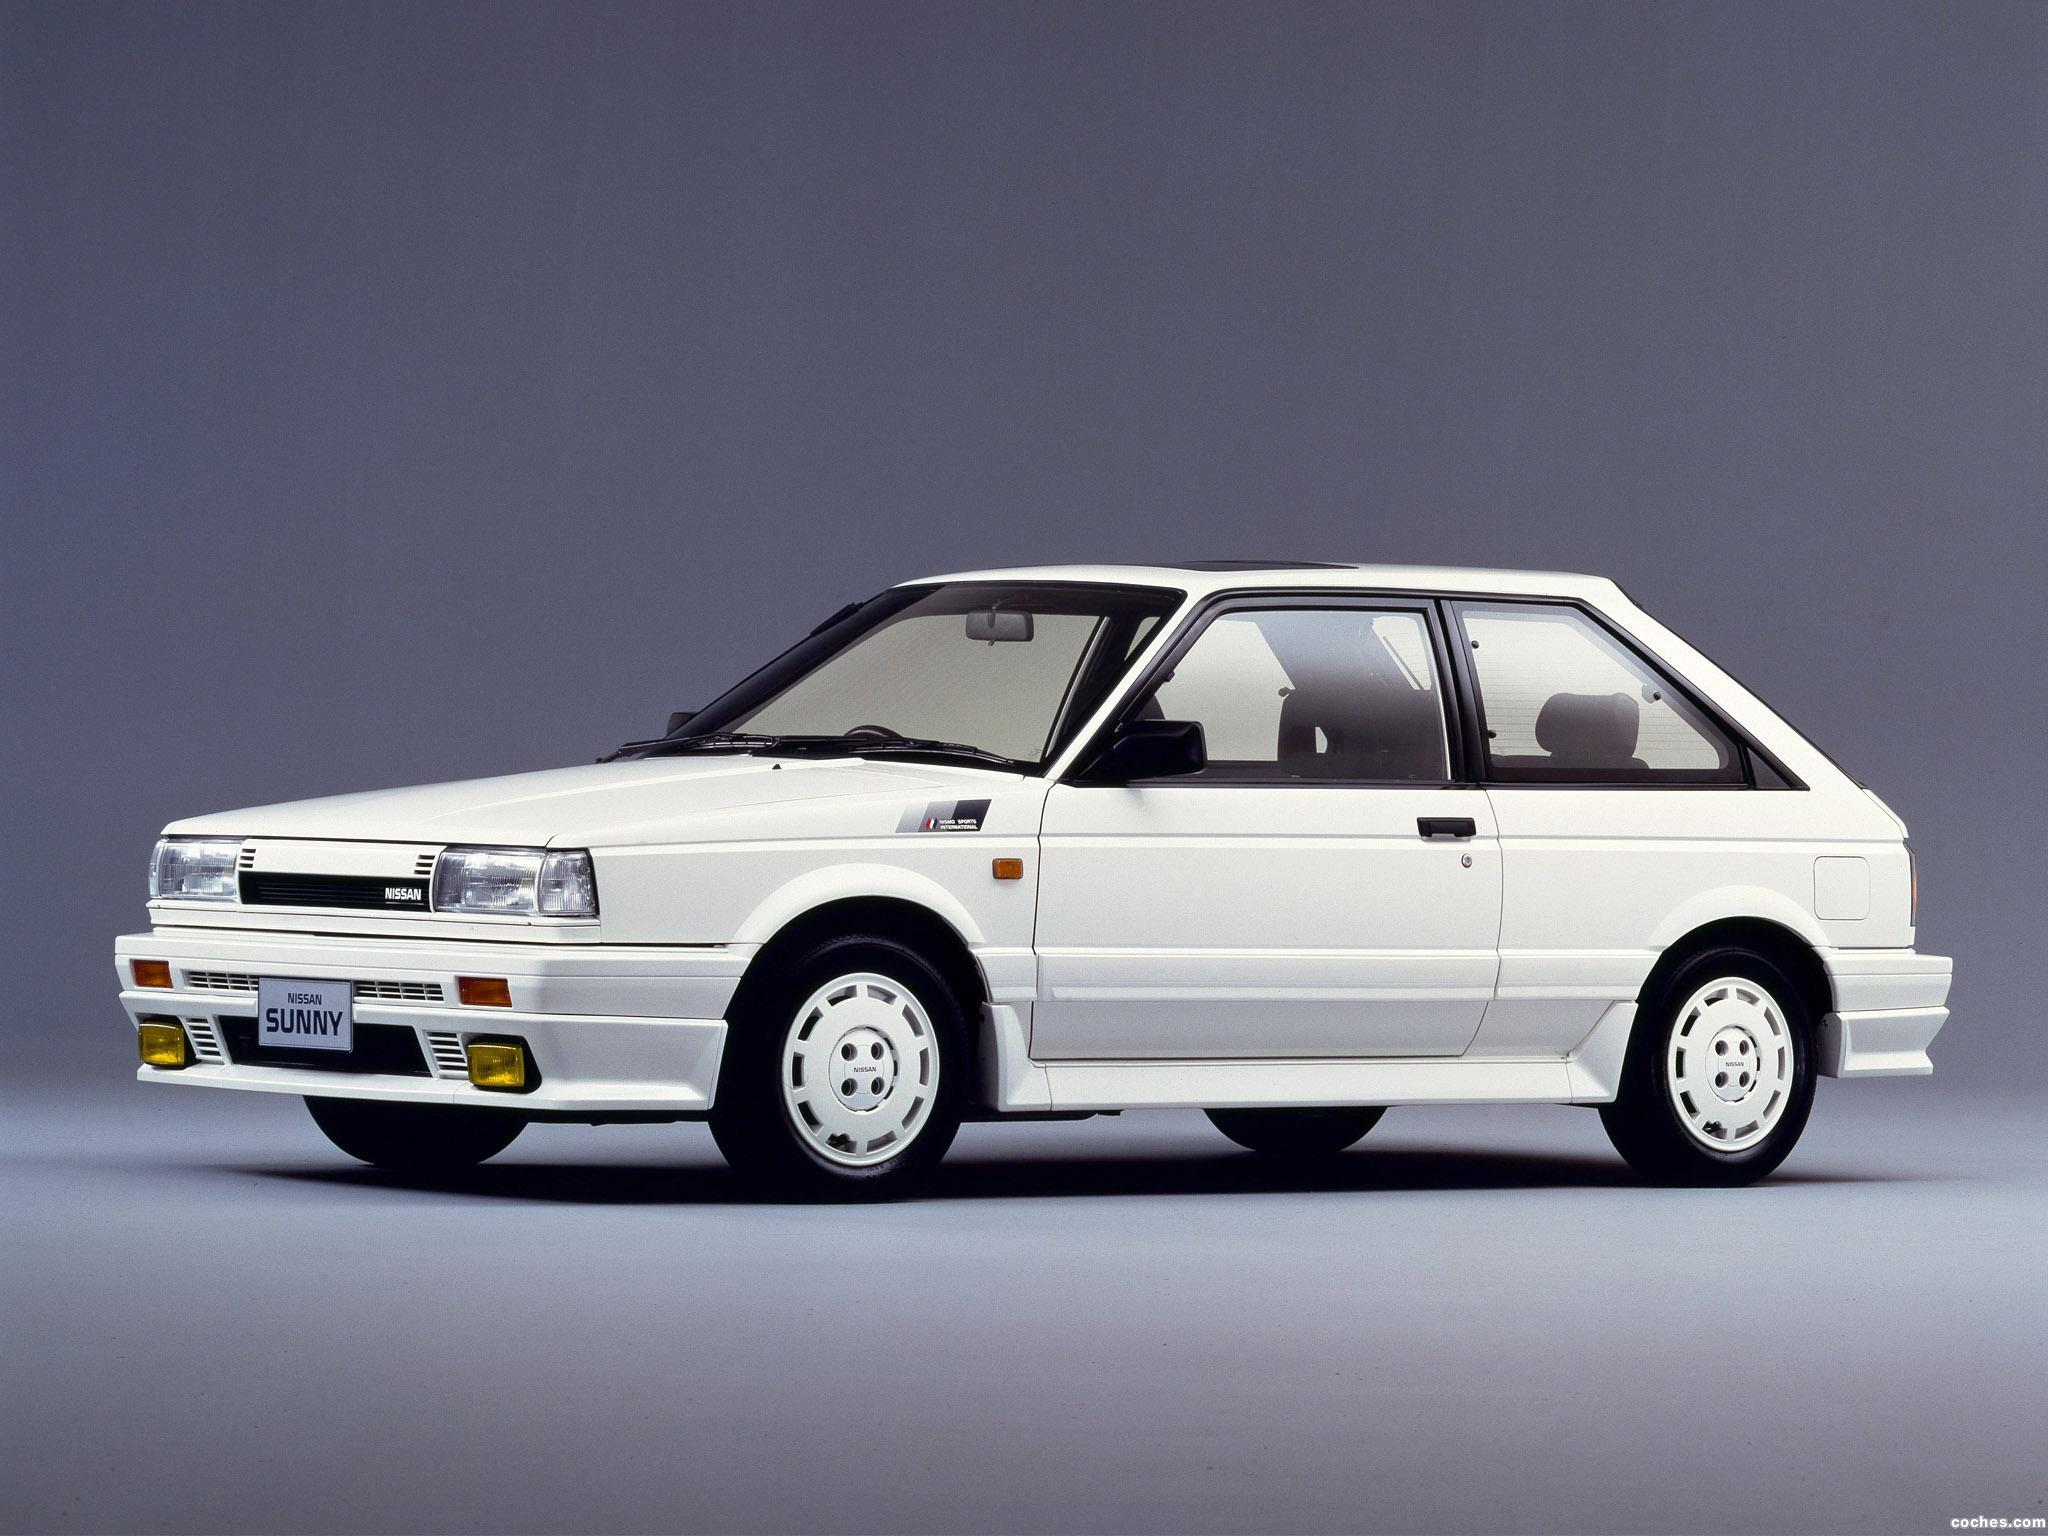 Fotos de Nissan nismo Sunny 305Re B12 1985